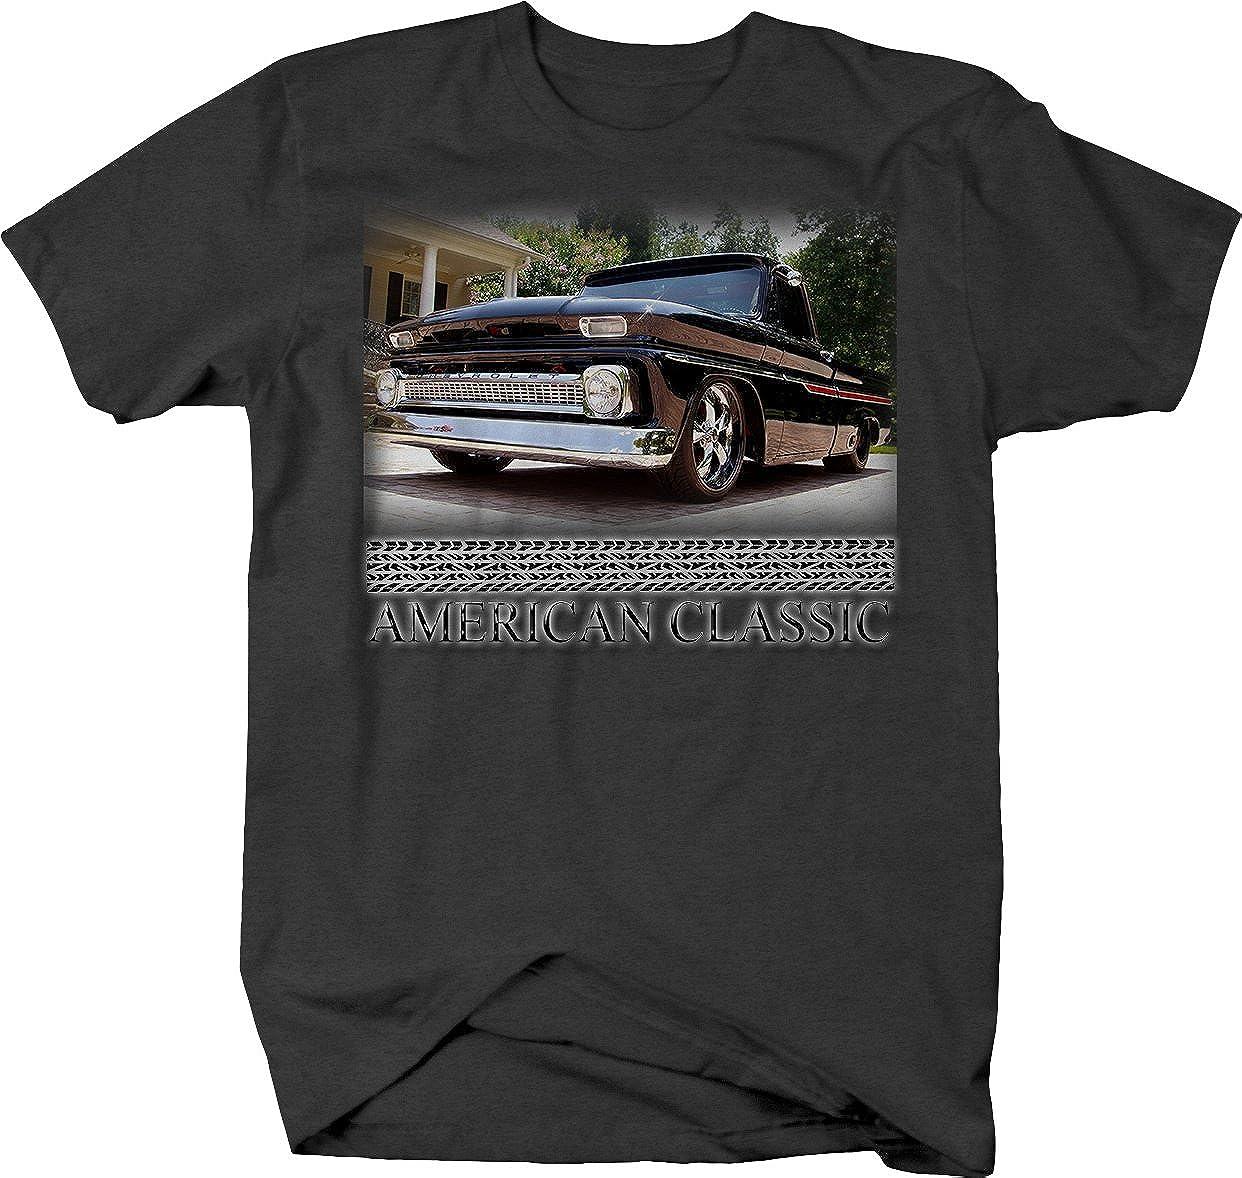 American Classic Muscle Car C10 Black /& Chrome Truck 1960-66 T Shirt for Men